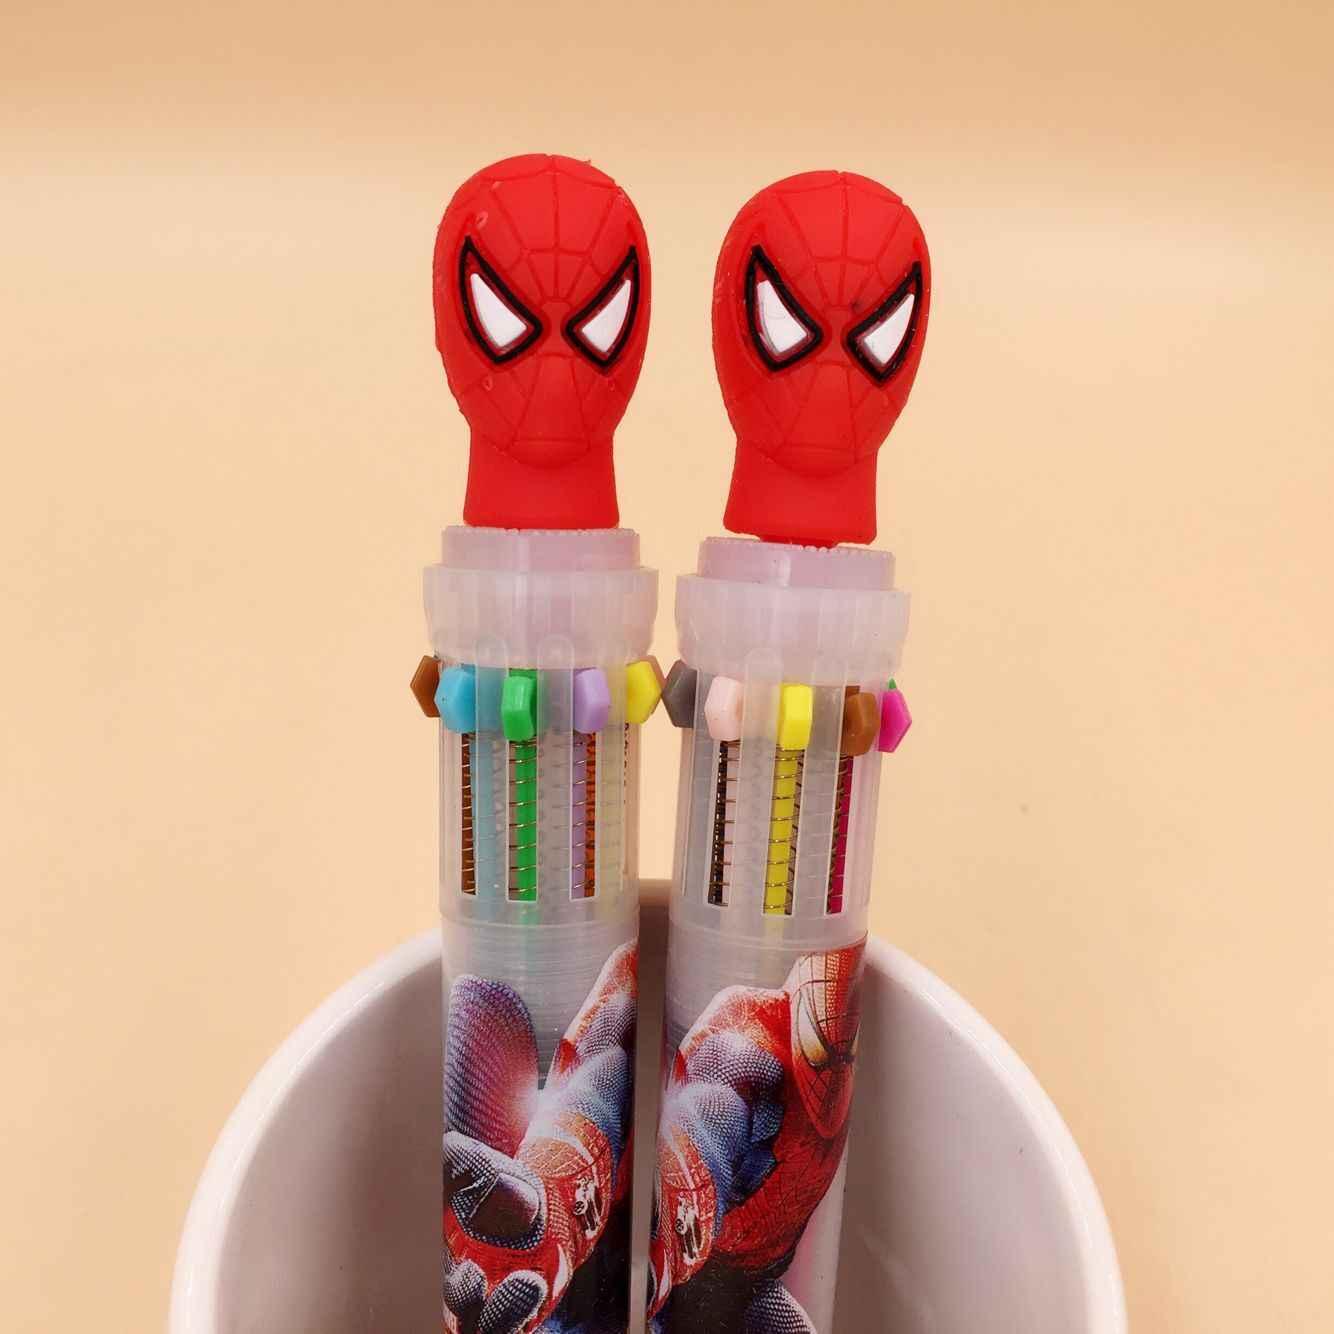 MARVEL Spiderman HERO 10 สี Chunky ปากกาลูกลื่นปากกาโรงเรียนซัพพลายของขวัญเครื่องเขียน Papelaria Escolar